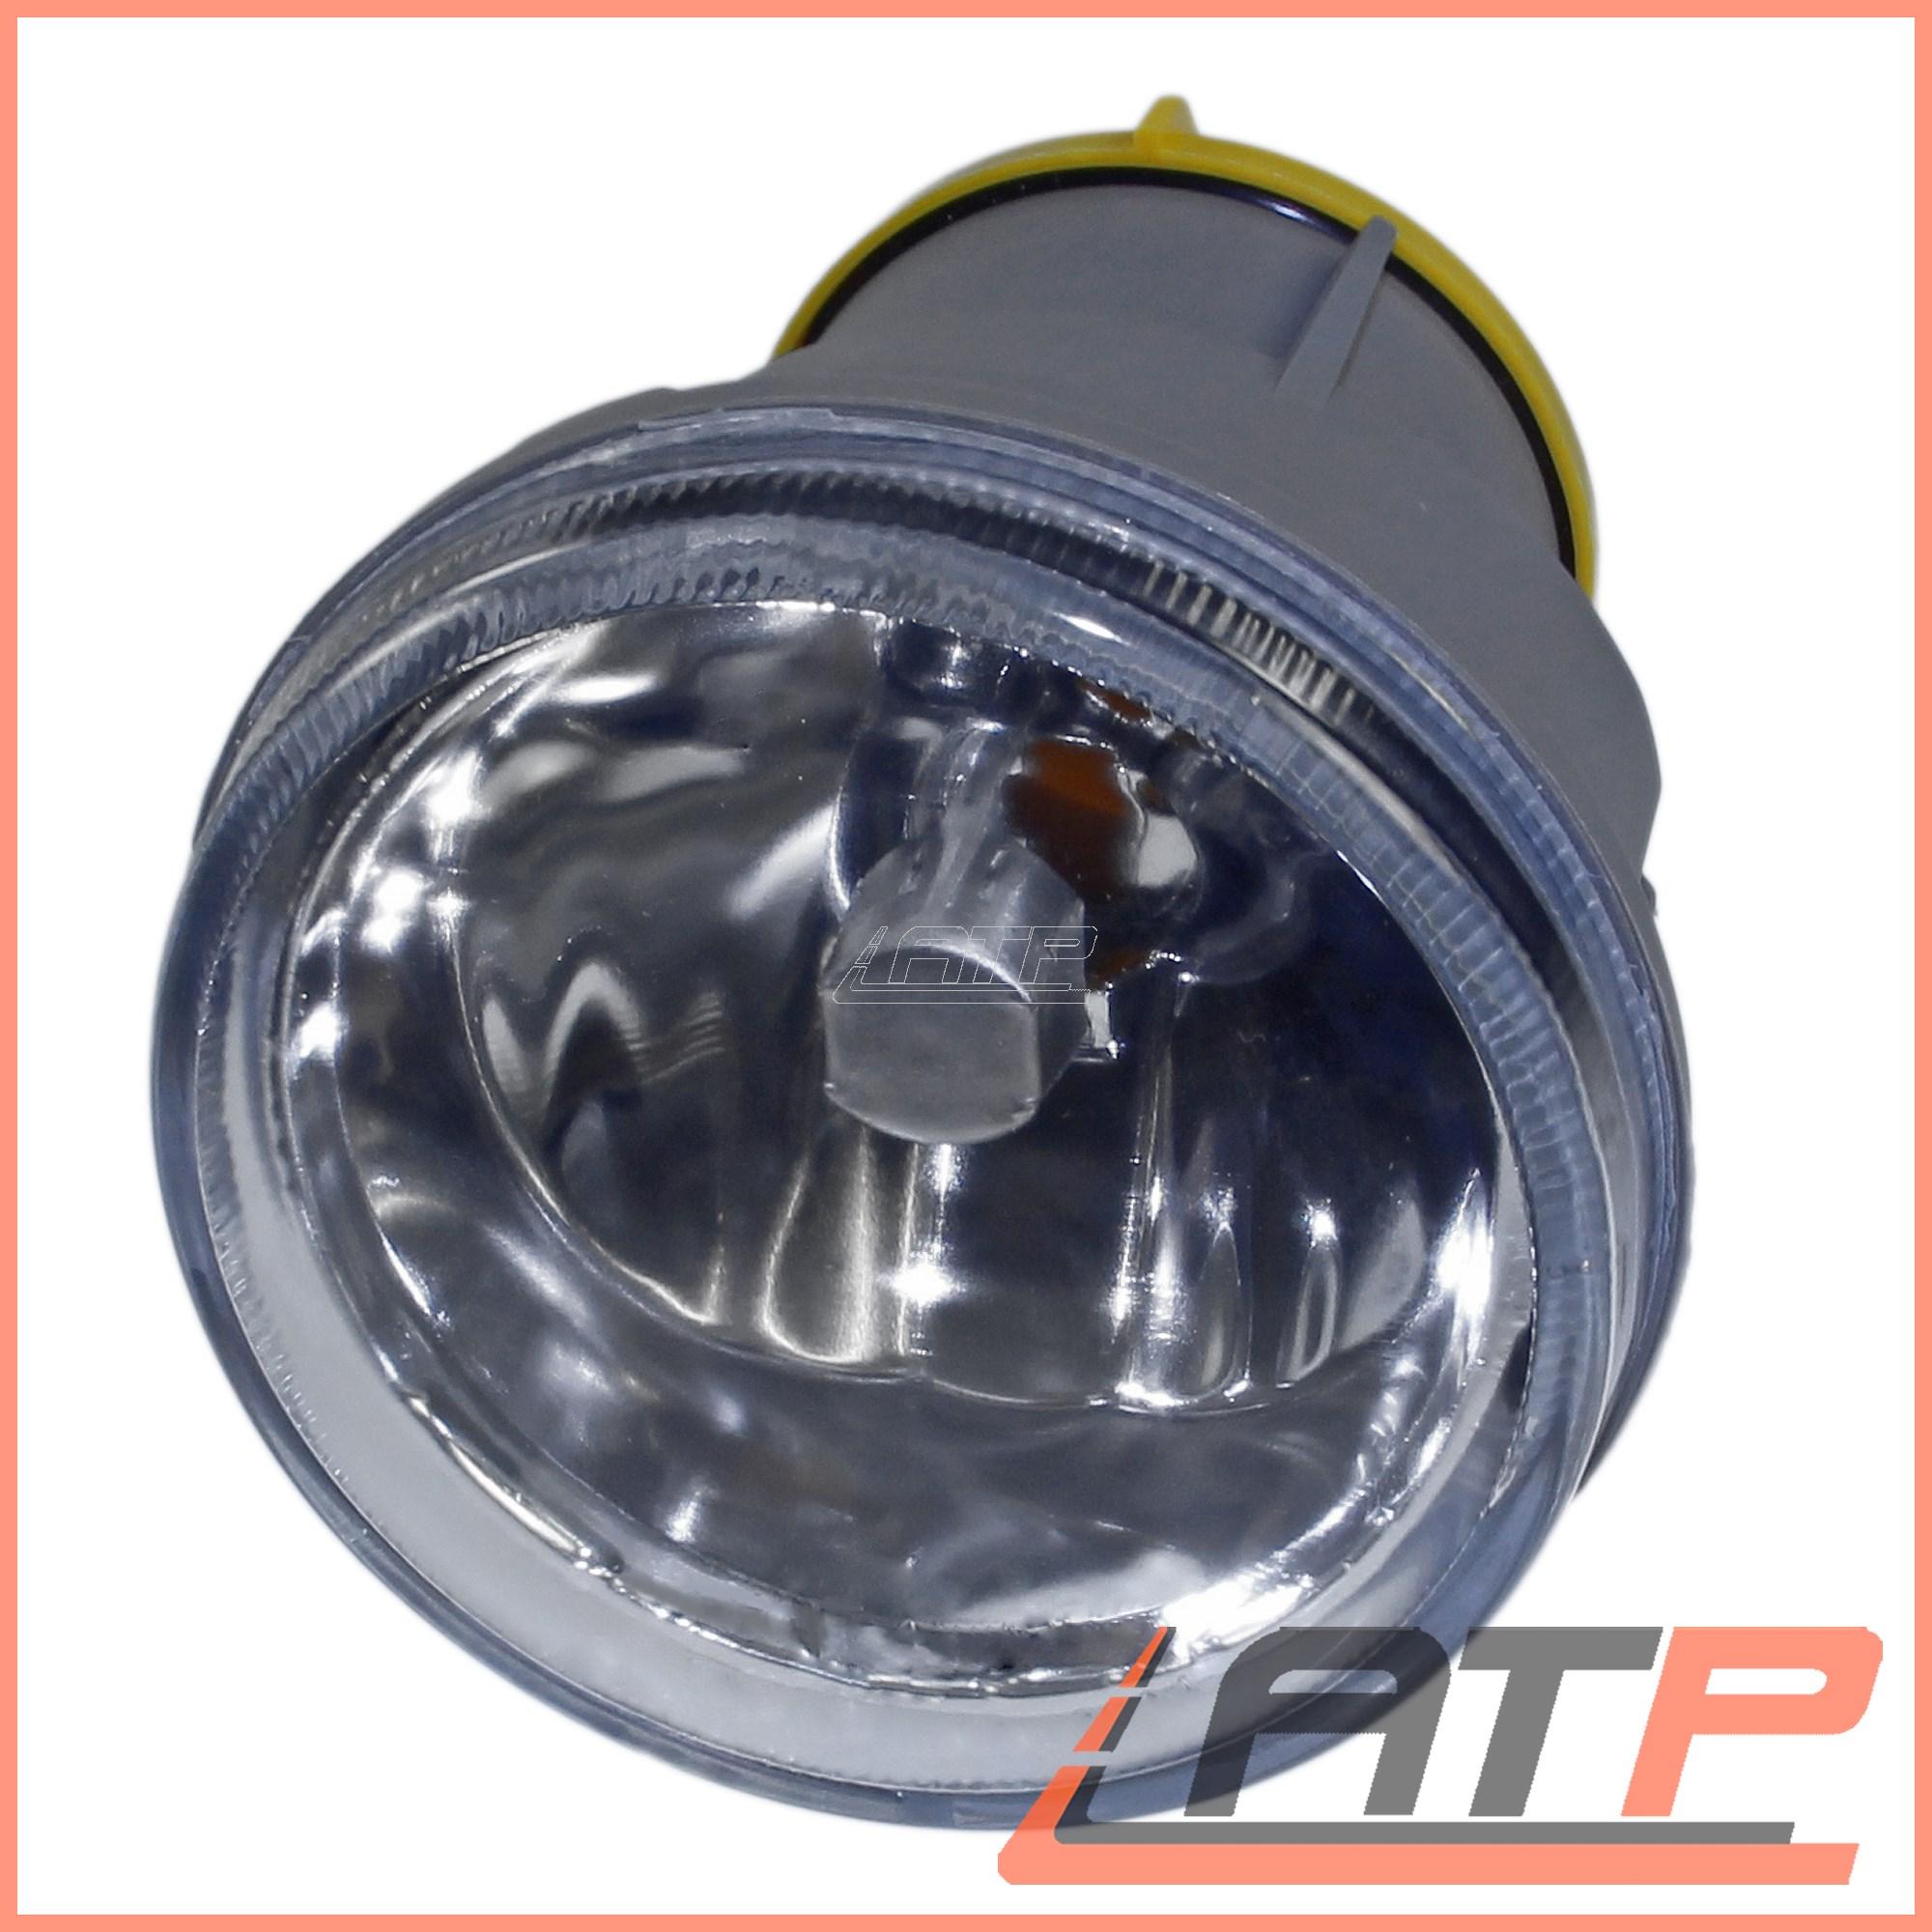 2x Citroen Nemo Genuine Osram Original Rear Indicator Light Bulbs Pair